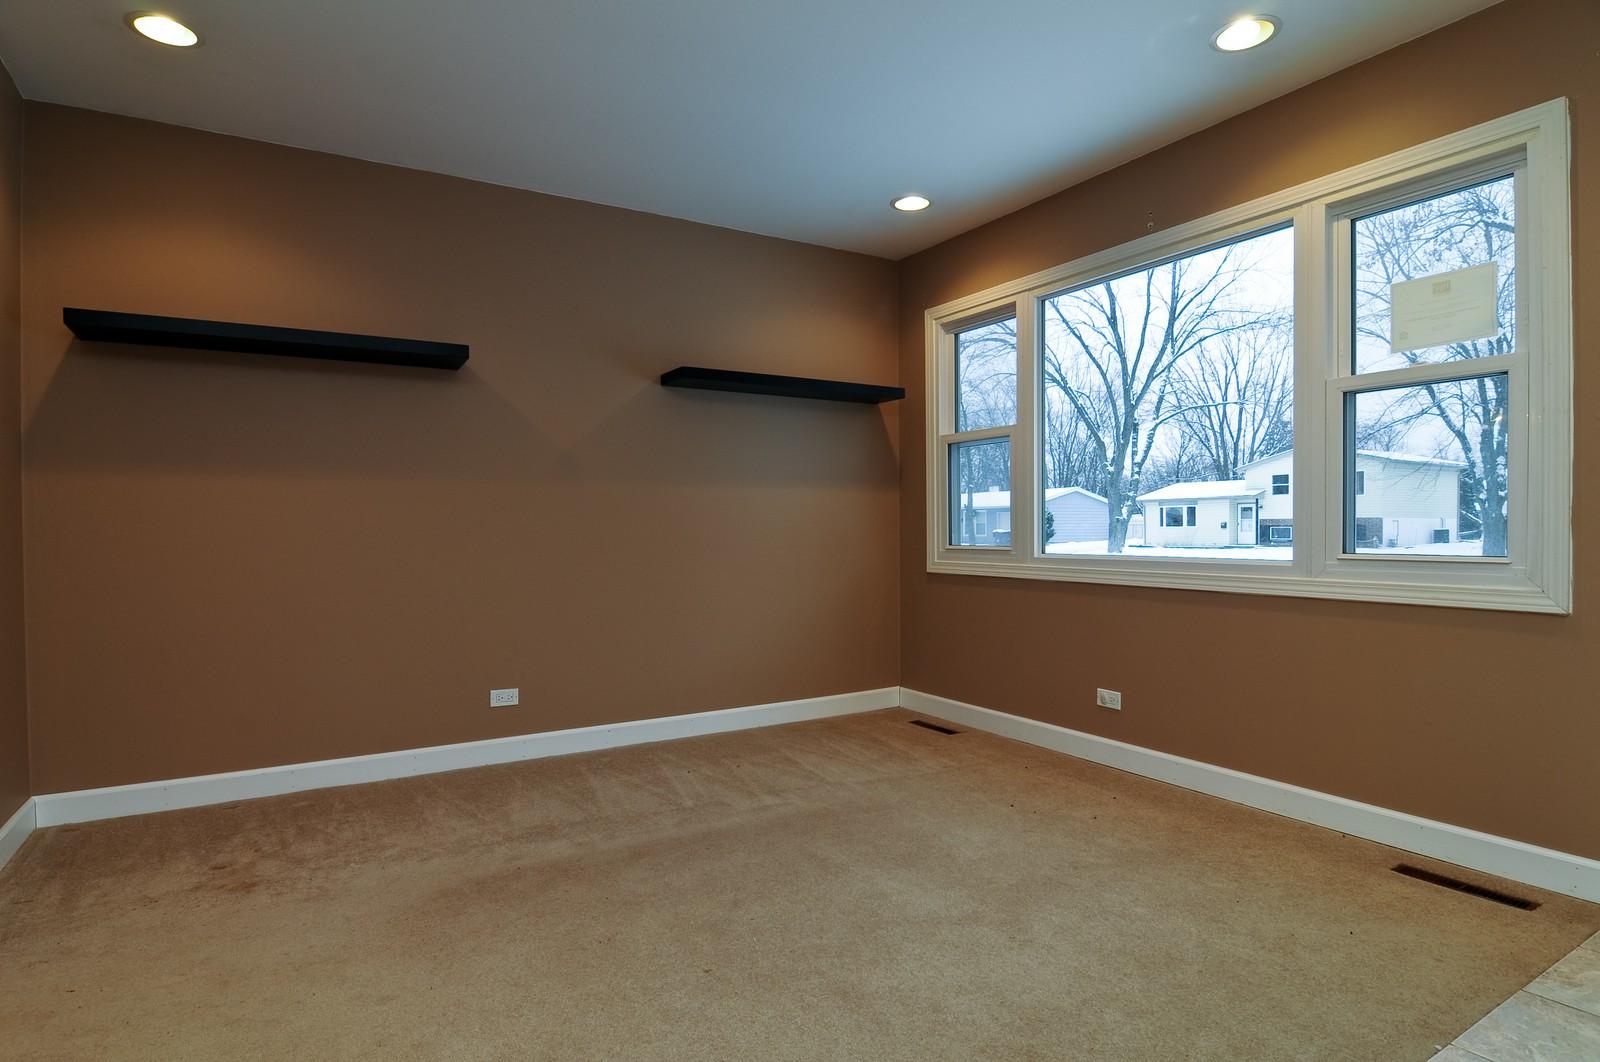 Real Estate Photography - 18648 W Pamela Pl, Gurnee, IL, 60031 - Living Room